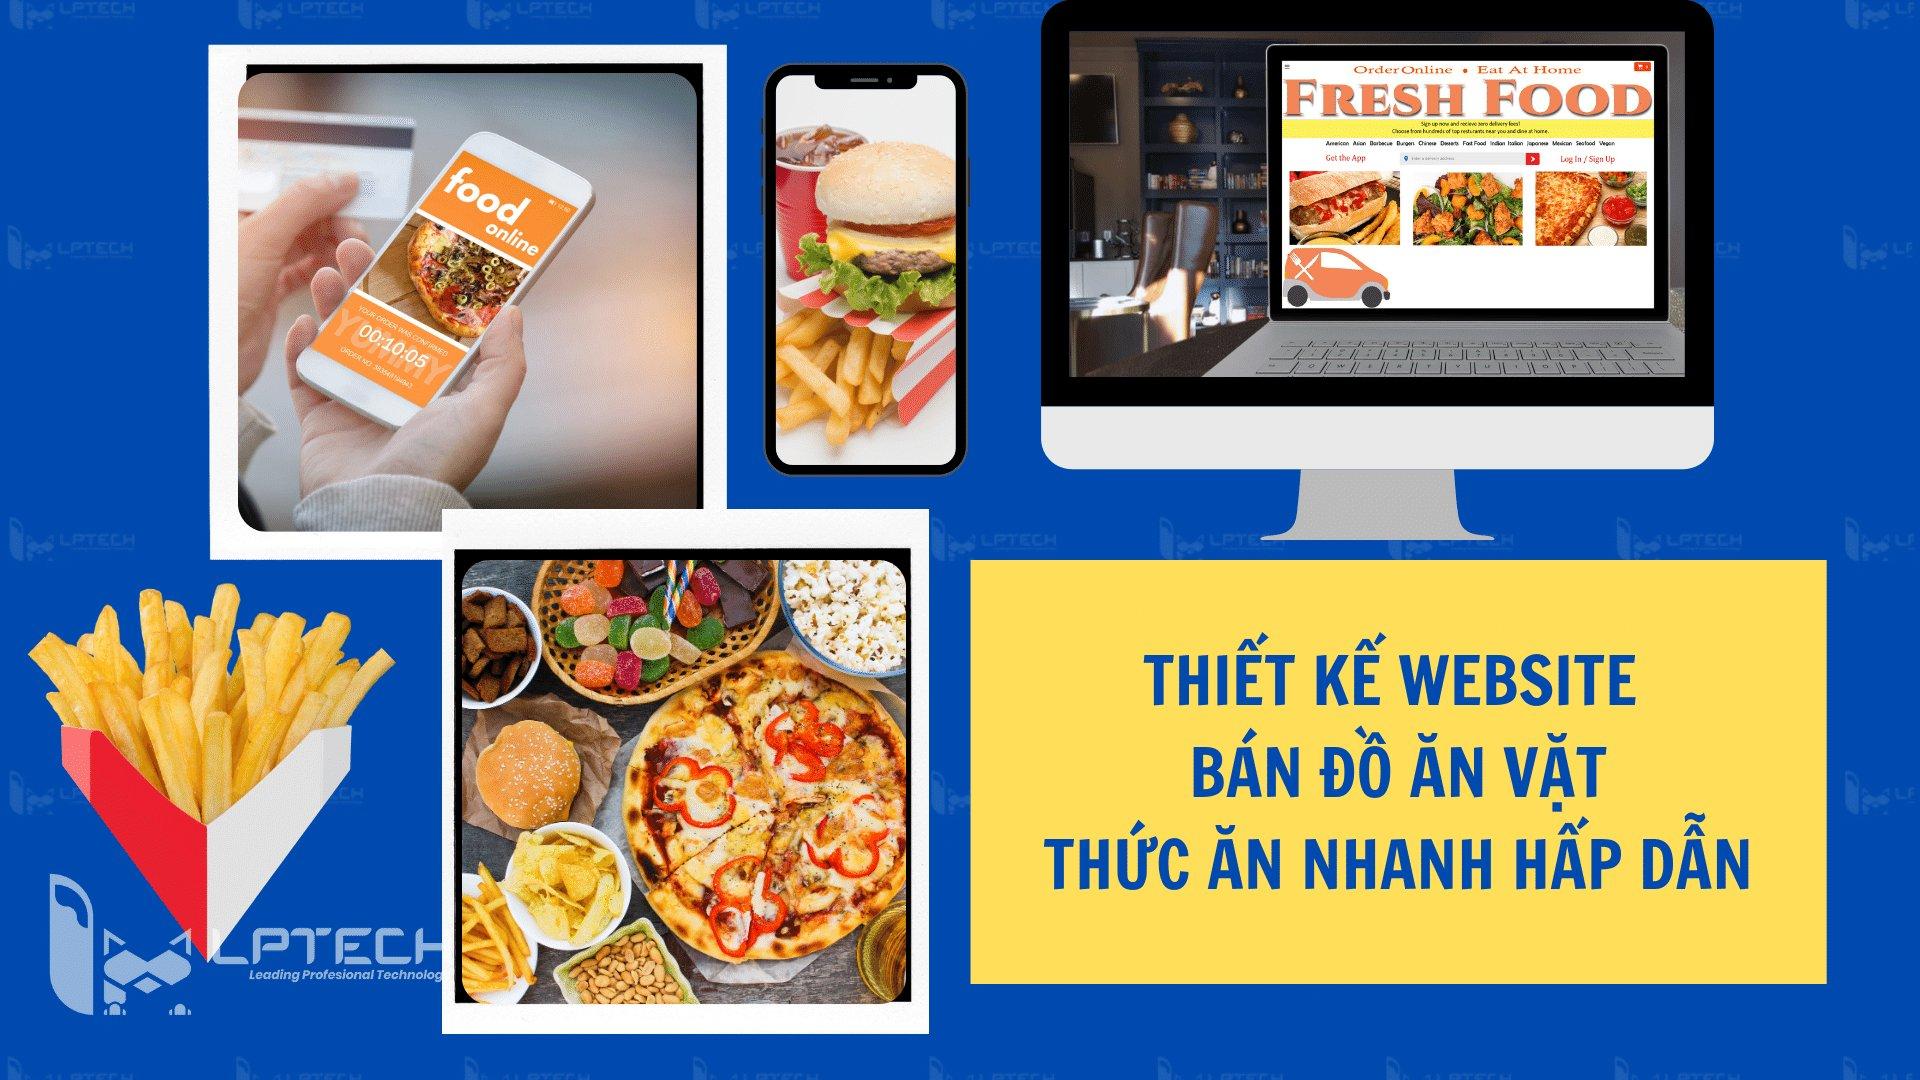 Thiết kế website bán đồ ăn vặt, thức ăn nhanh hấp dẫn